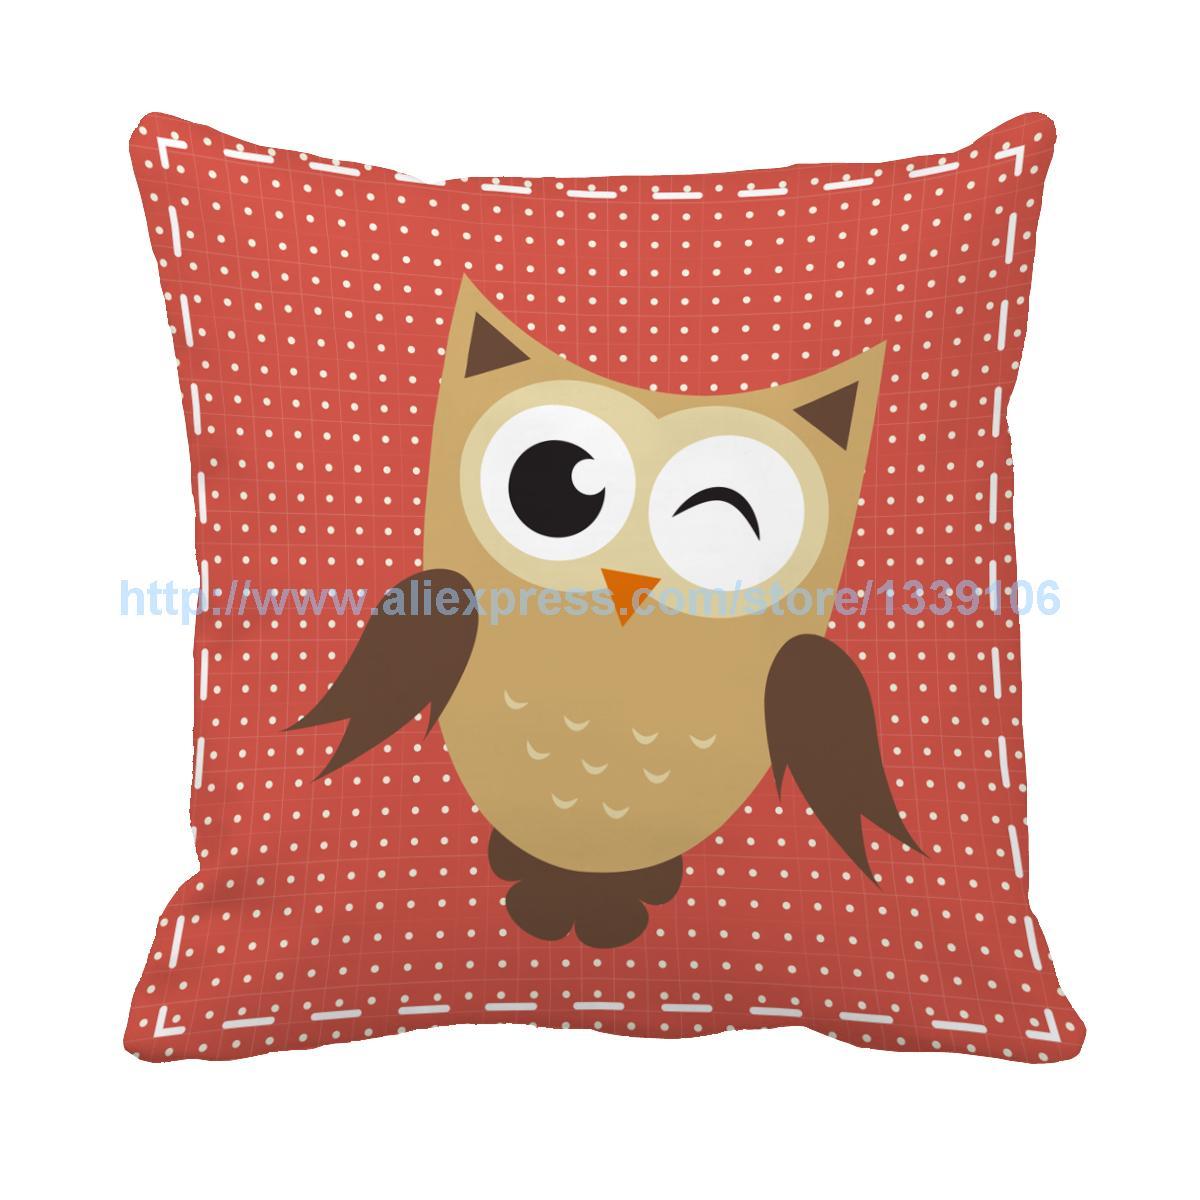 Cartoon owls series print custom light color accent pillows for sofas kids chair cushion home decor almofada deccorative pillows